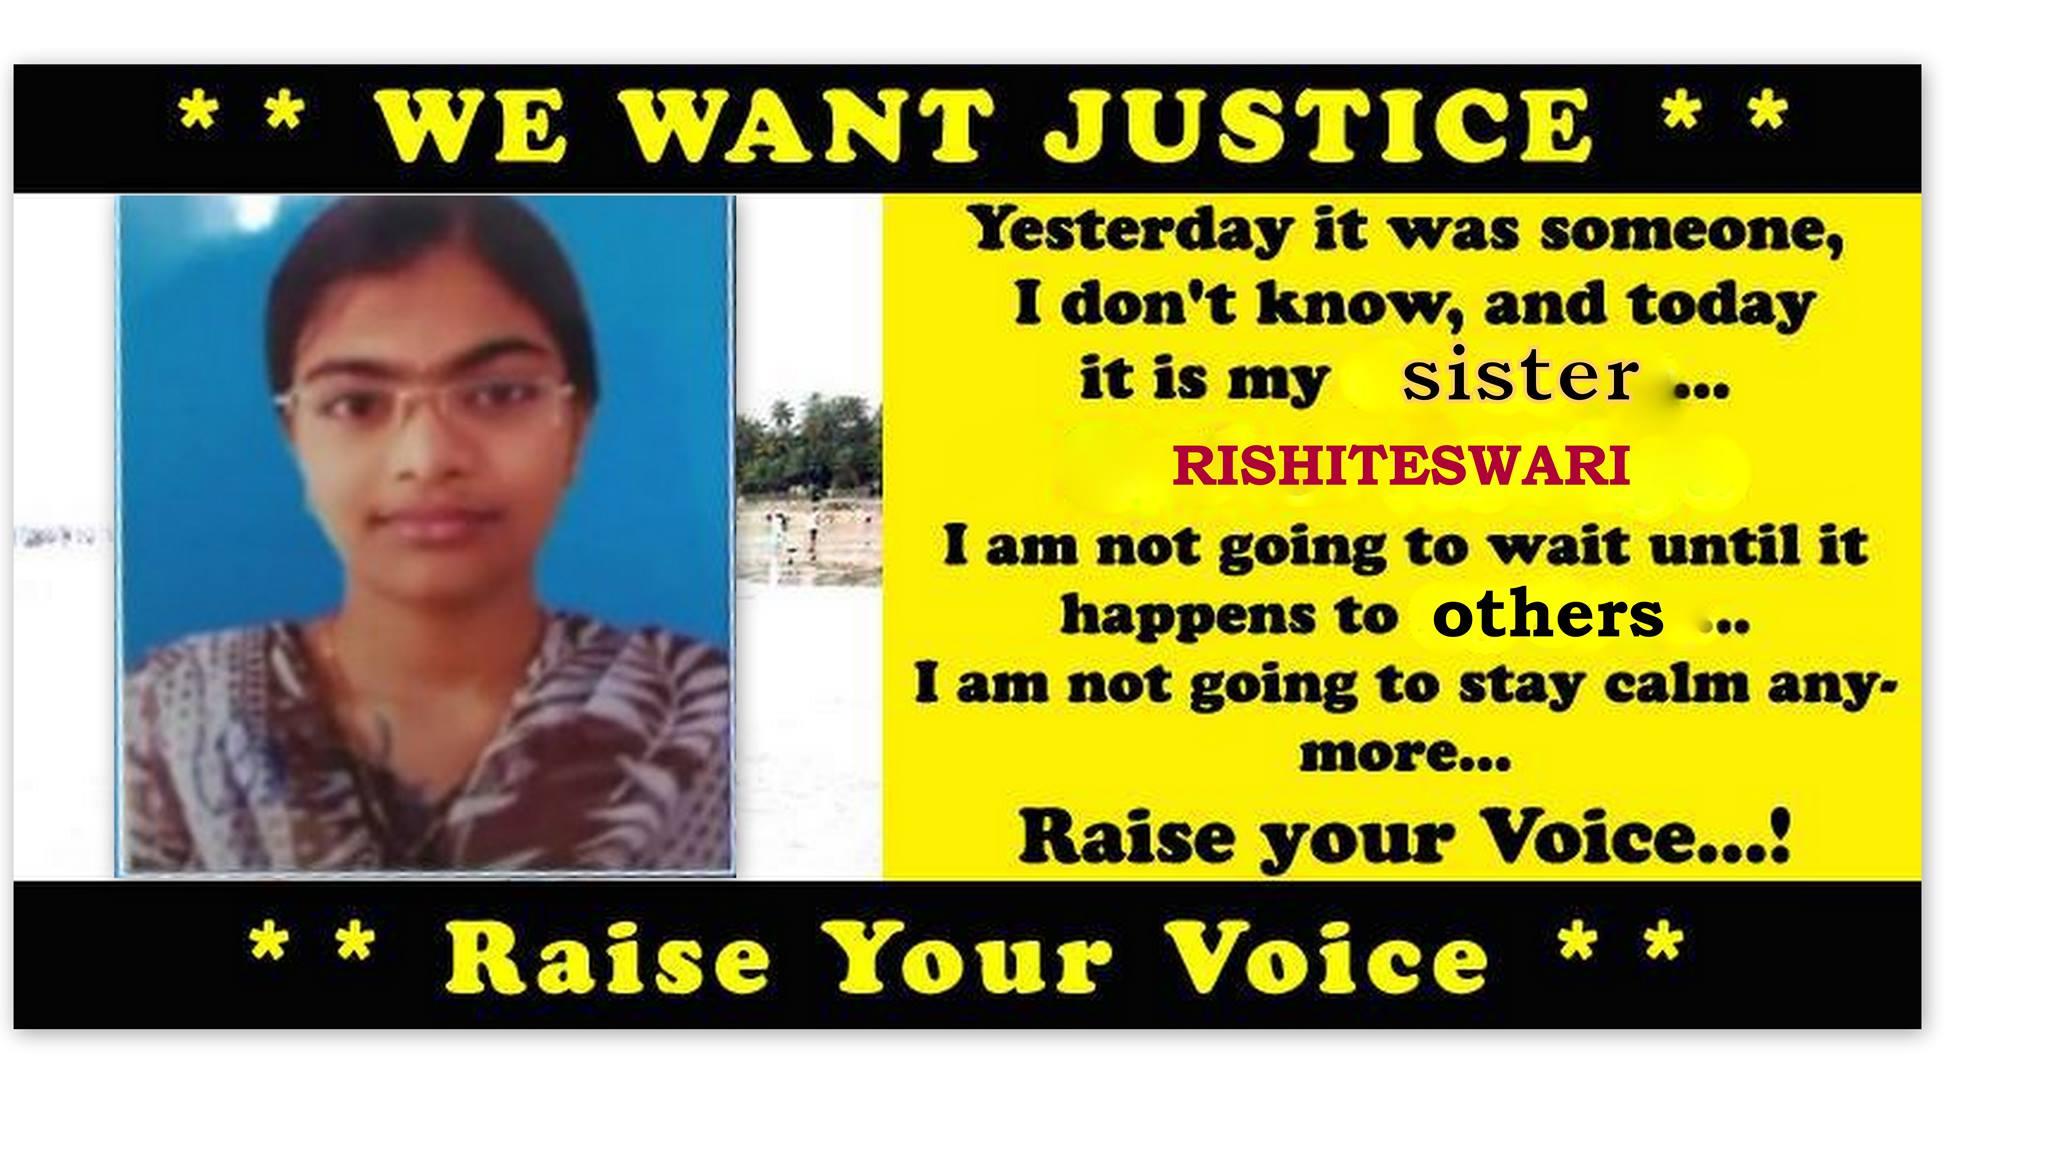 Rishiteswari's Death is a Suicide? or a Murder?